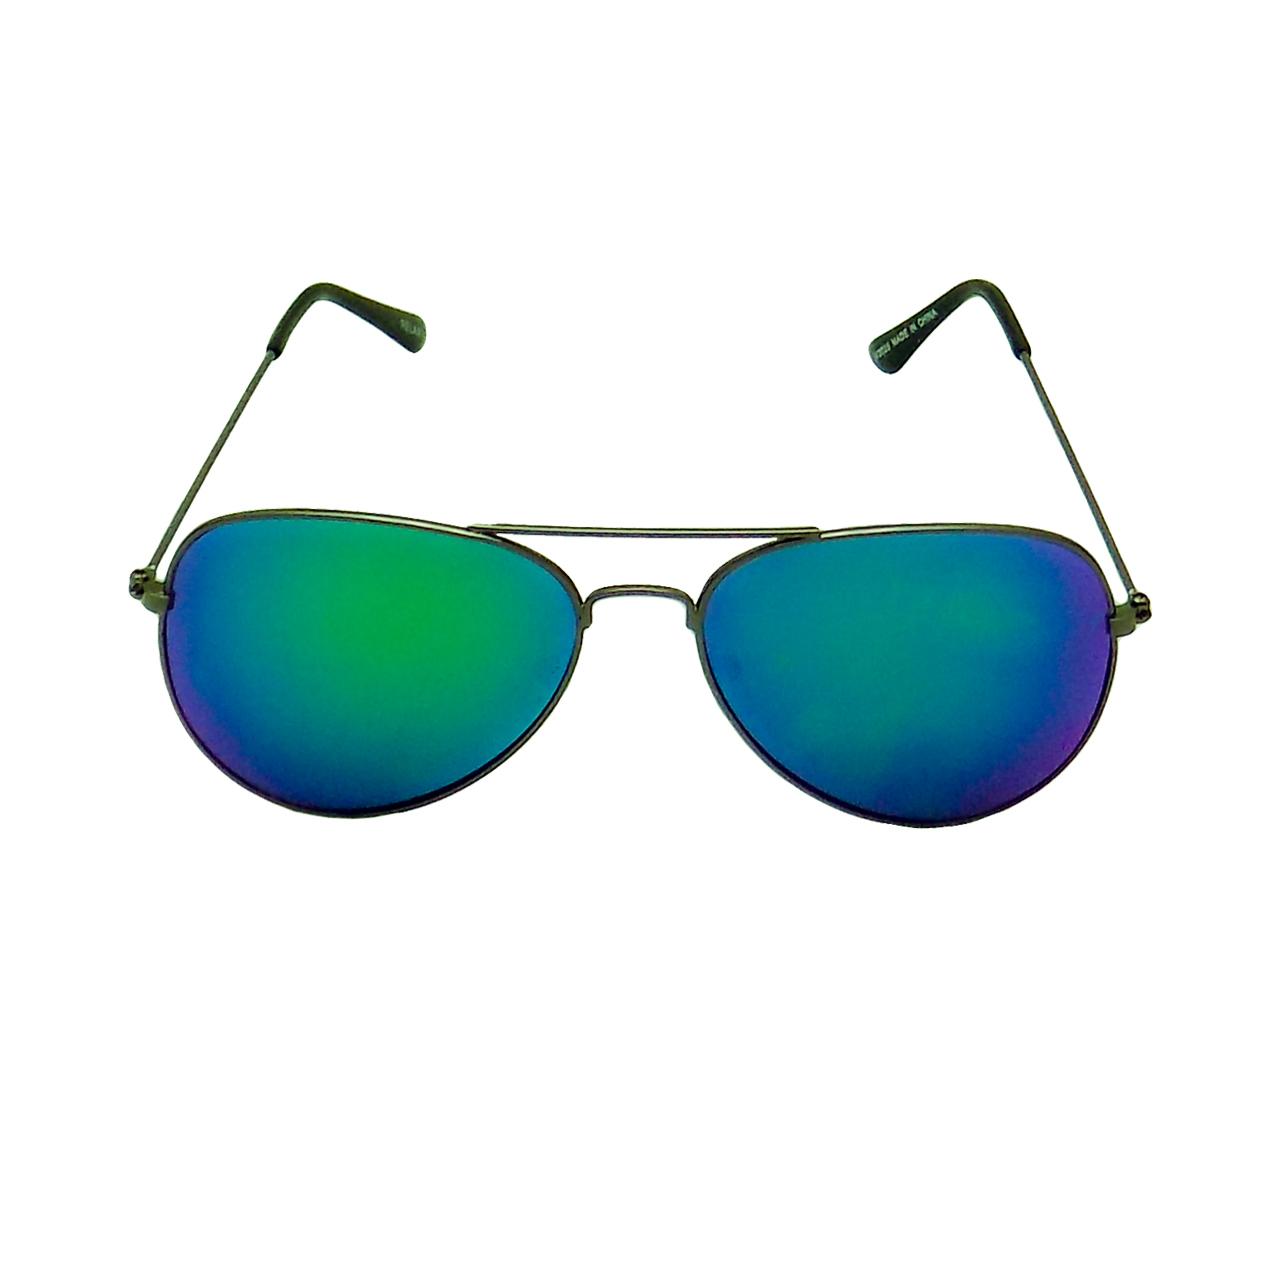 عکس عینک آفتابی کد  66